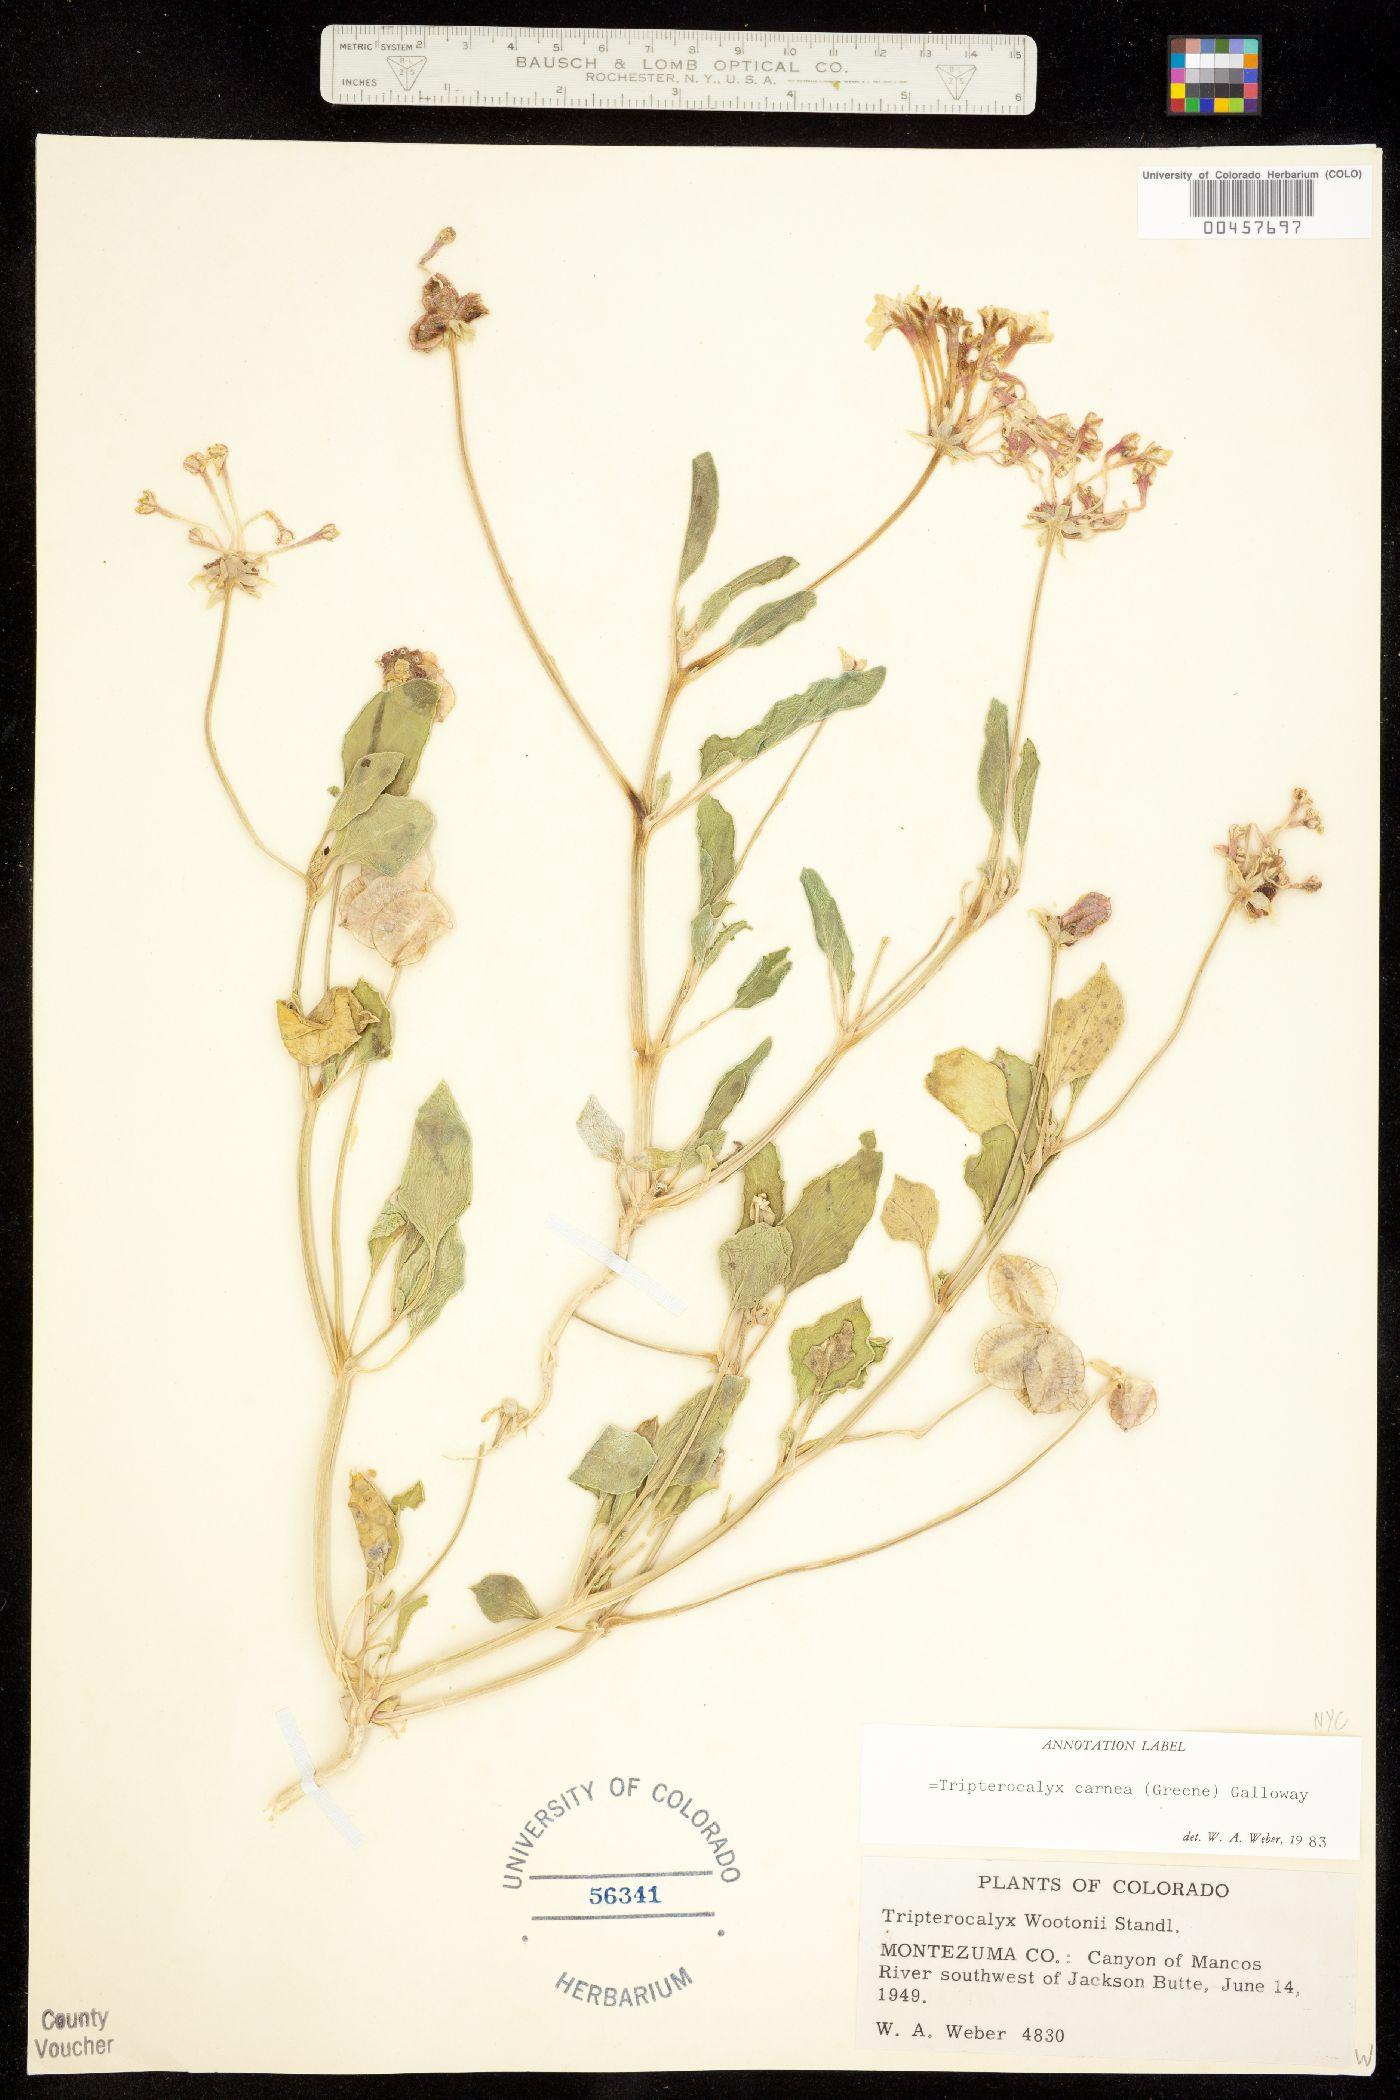 Tripterocalyx carneus var. wootonii image